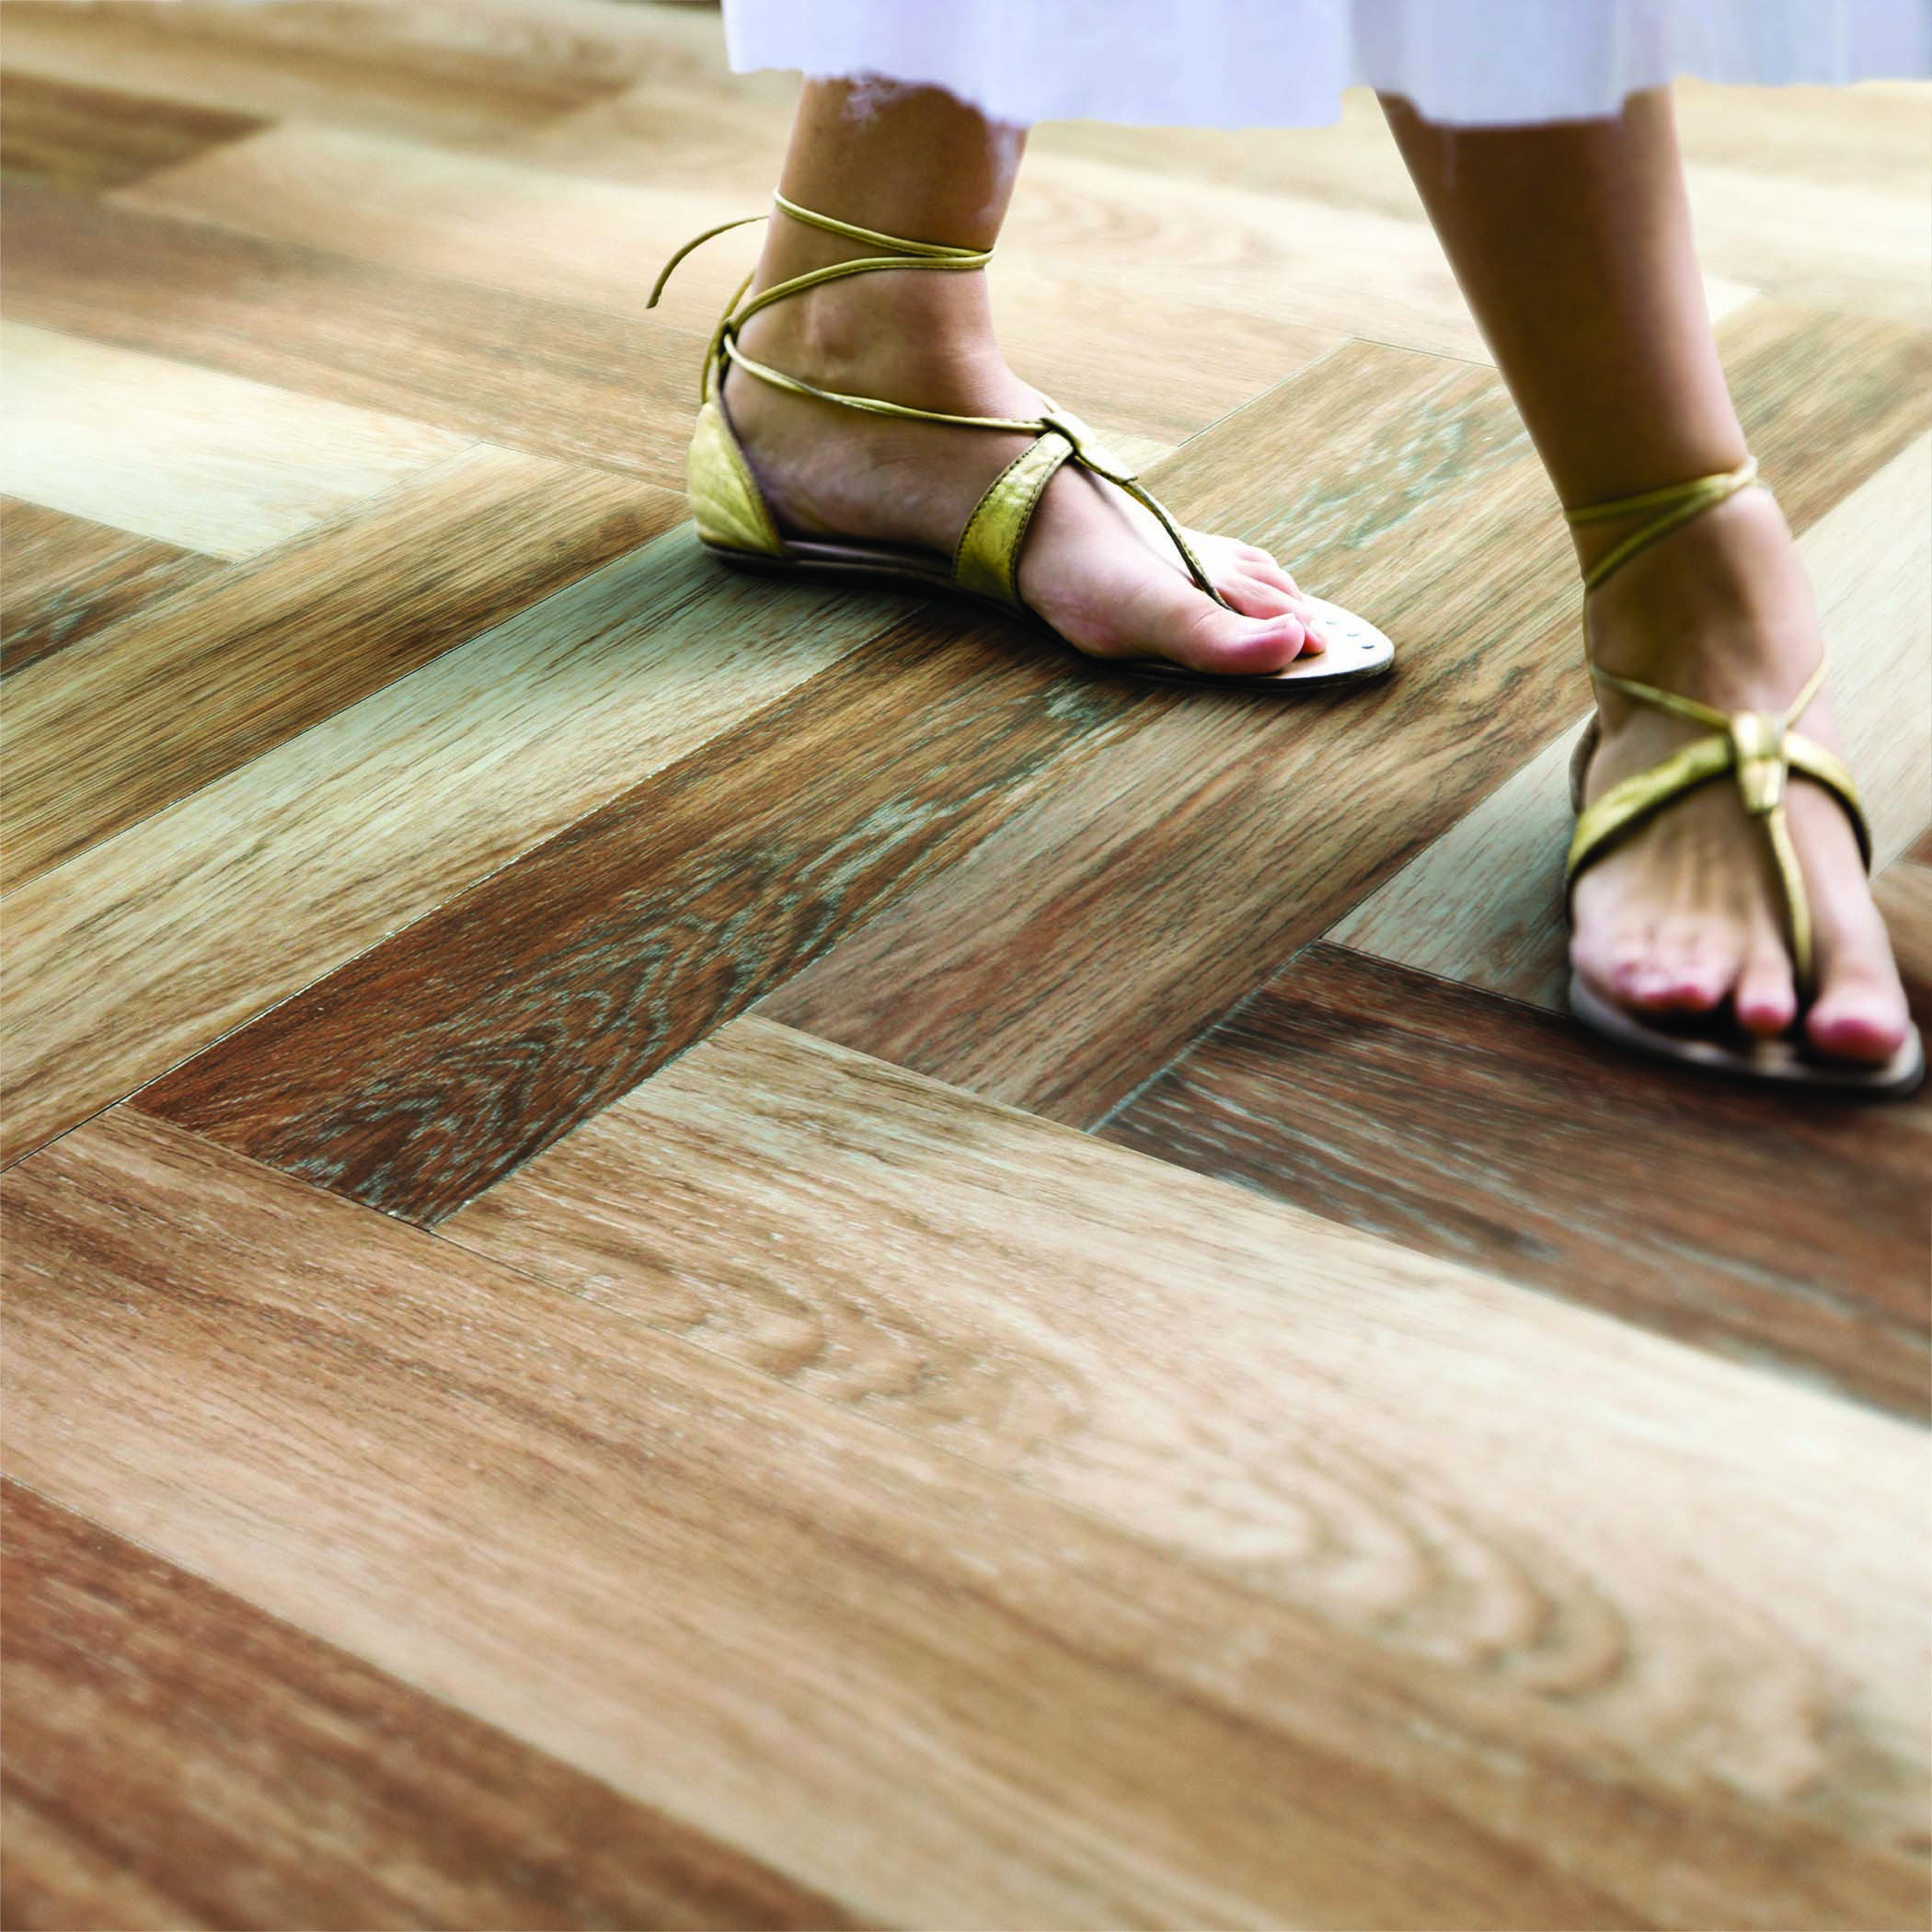 How to install ceramic tile that looks like wood images tile mediterranea usa porcelain tile porcelain tile porcelain and mediterranea usa porcelain tile ceramic tile floors that doublecrazyfo Images